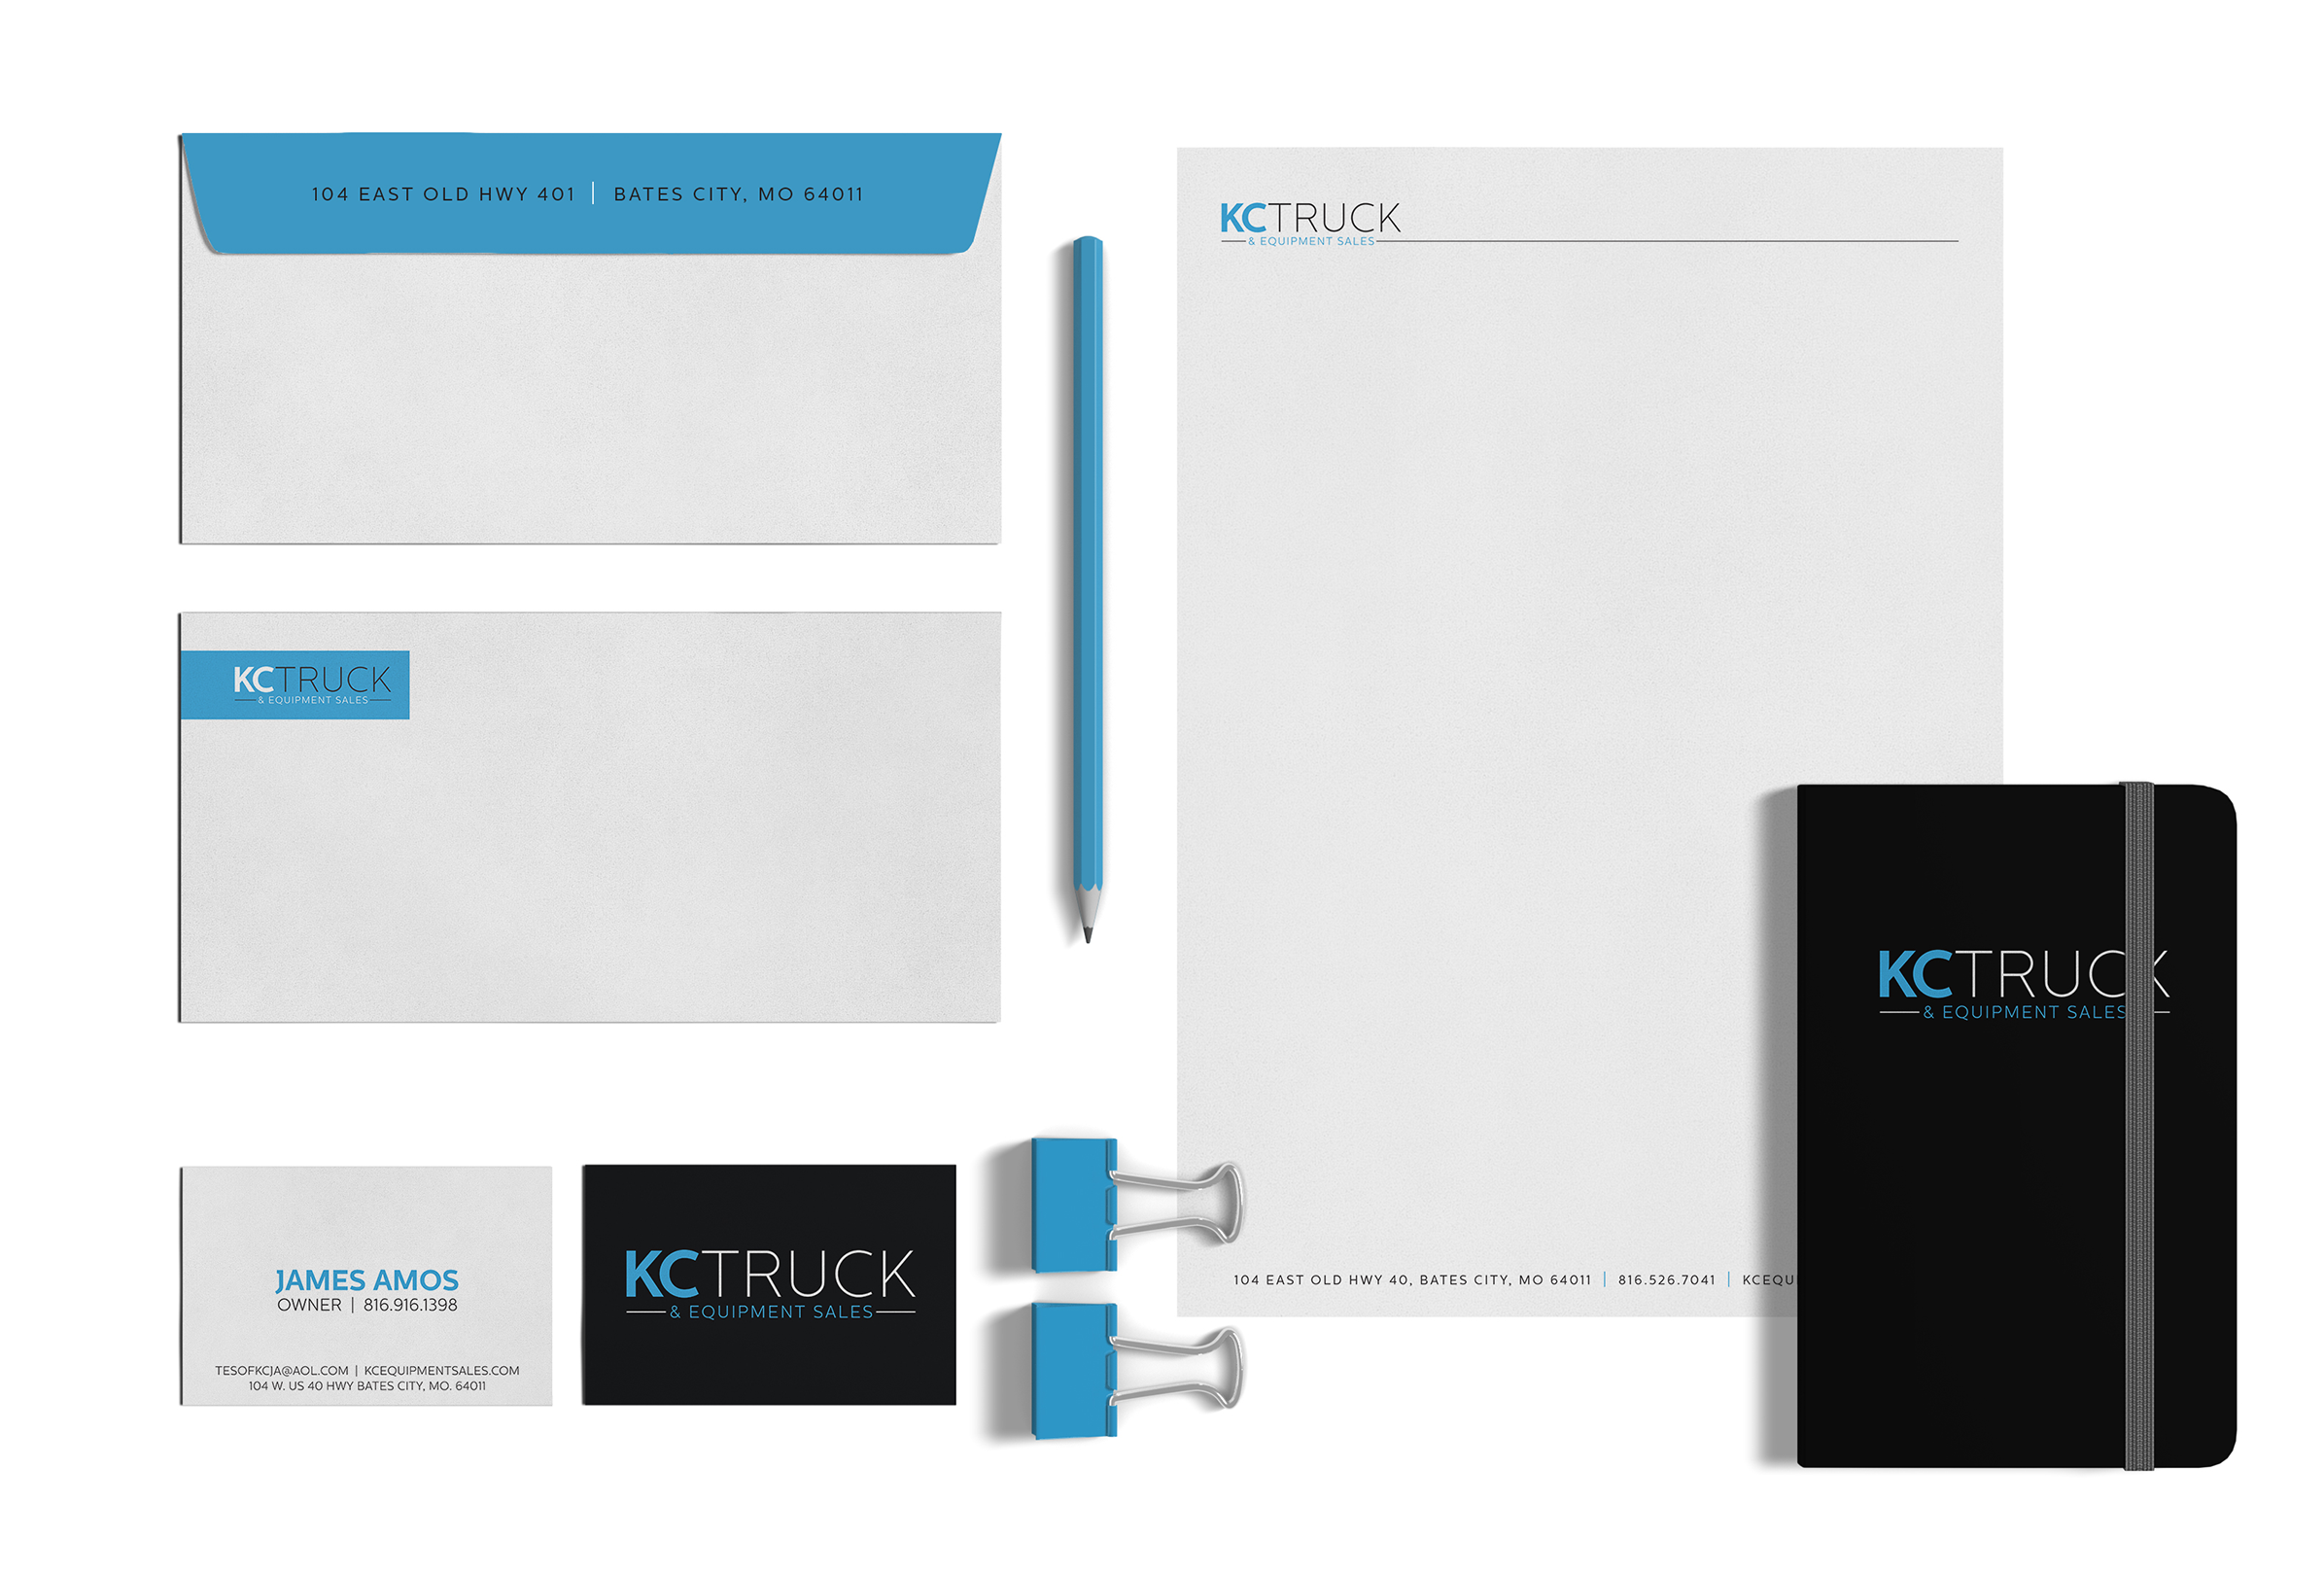 KC Truck & Equipment Company Stationery